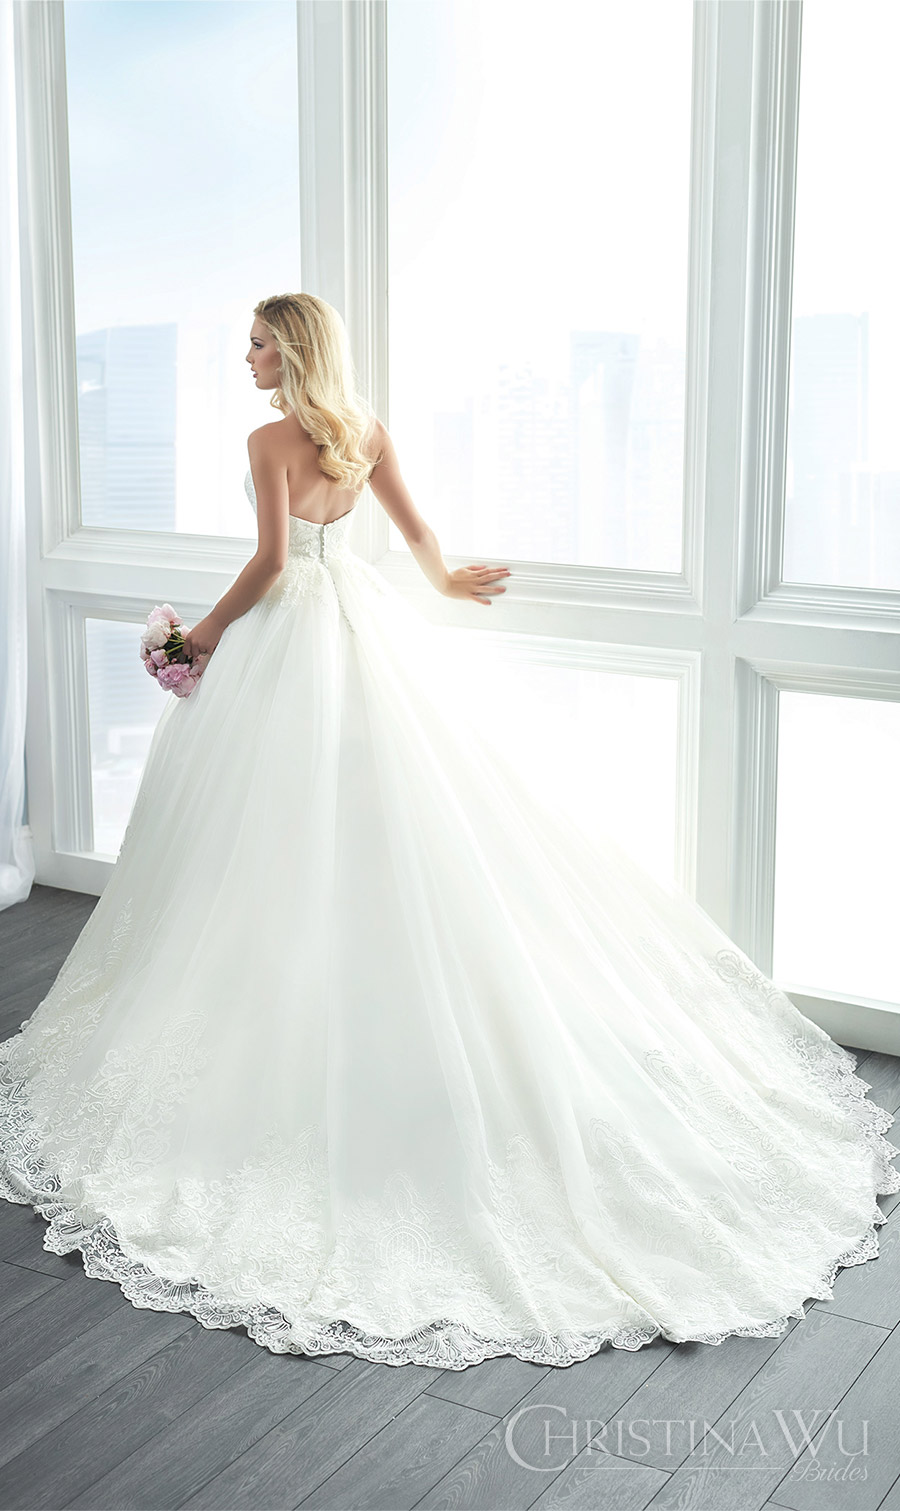 christina wu brides spring 2017 bridal strapless sweetheart lace embellished ball gown wedding dress (15621) bv romantic princess train